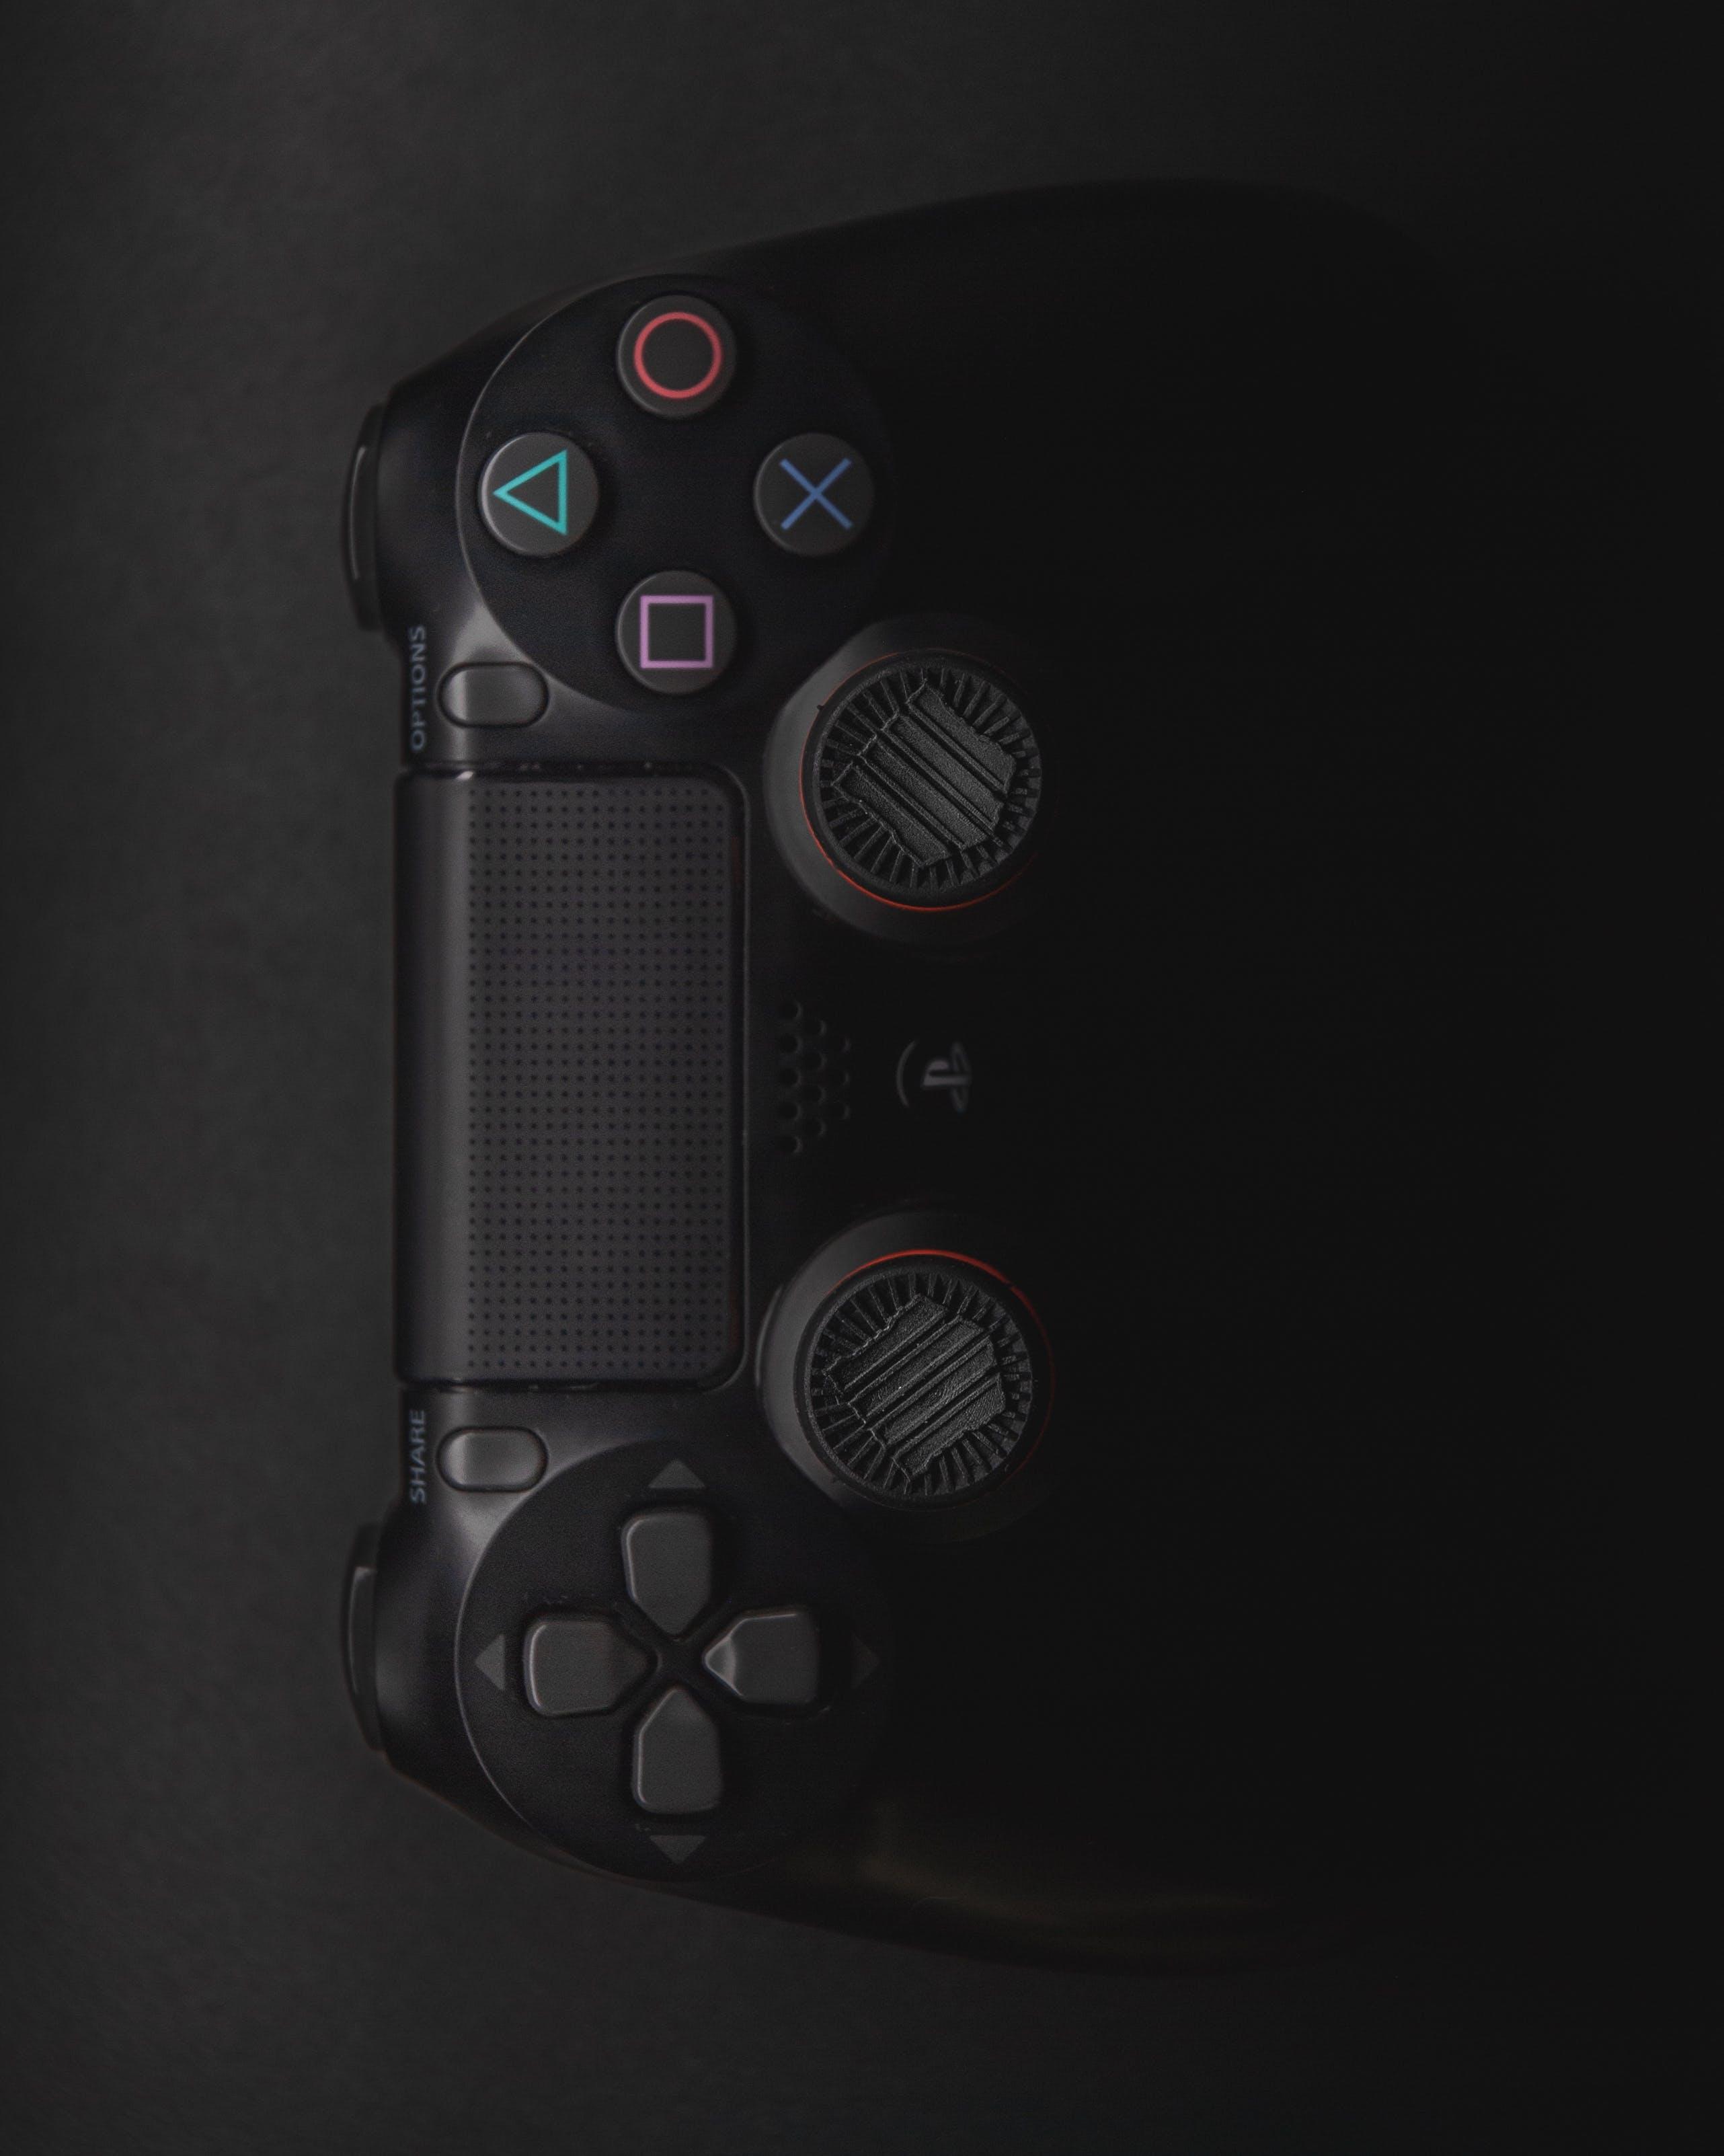 Black Sony Dualshock 4